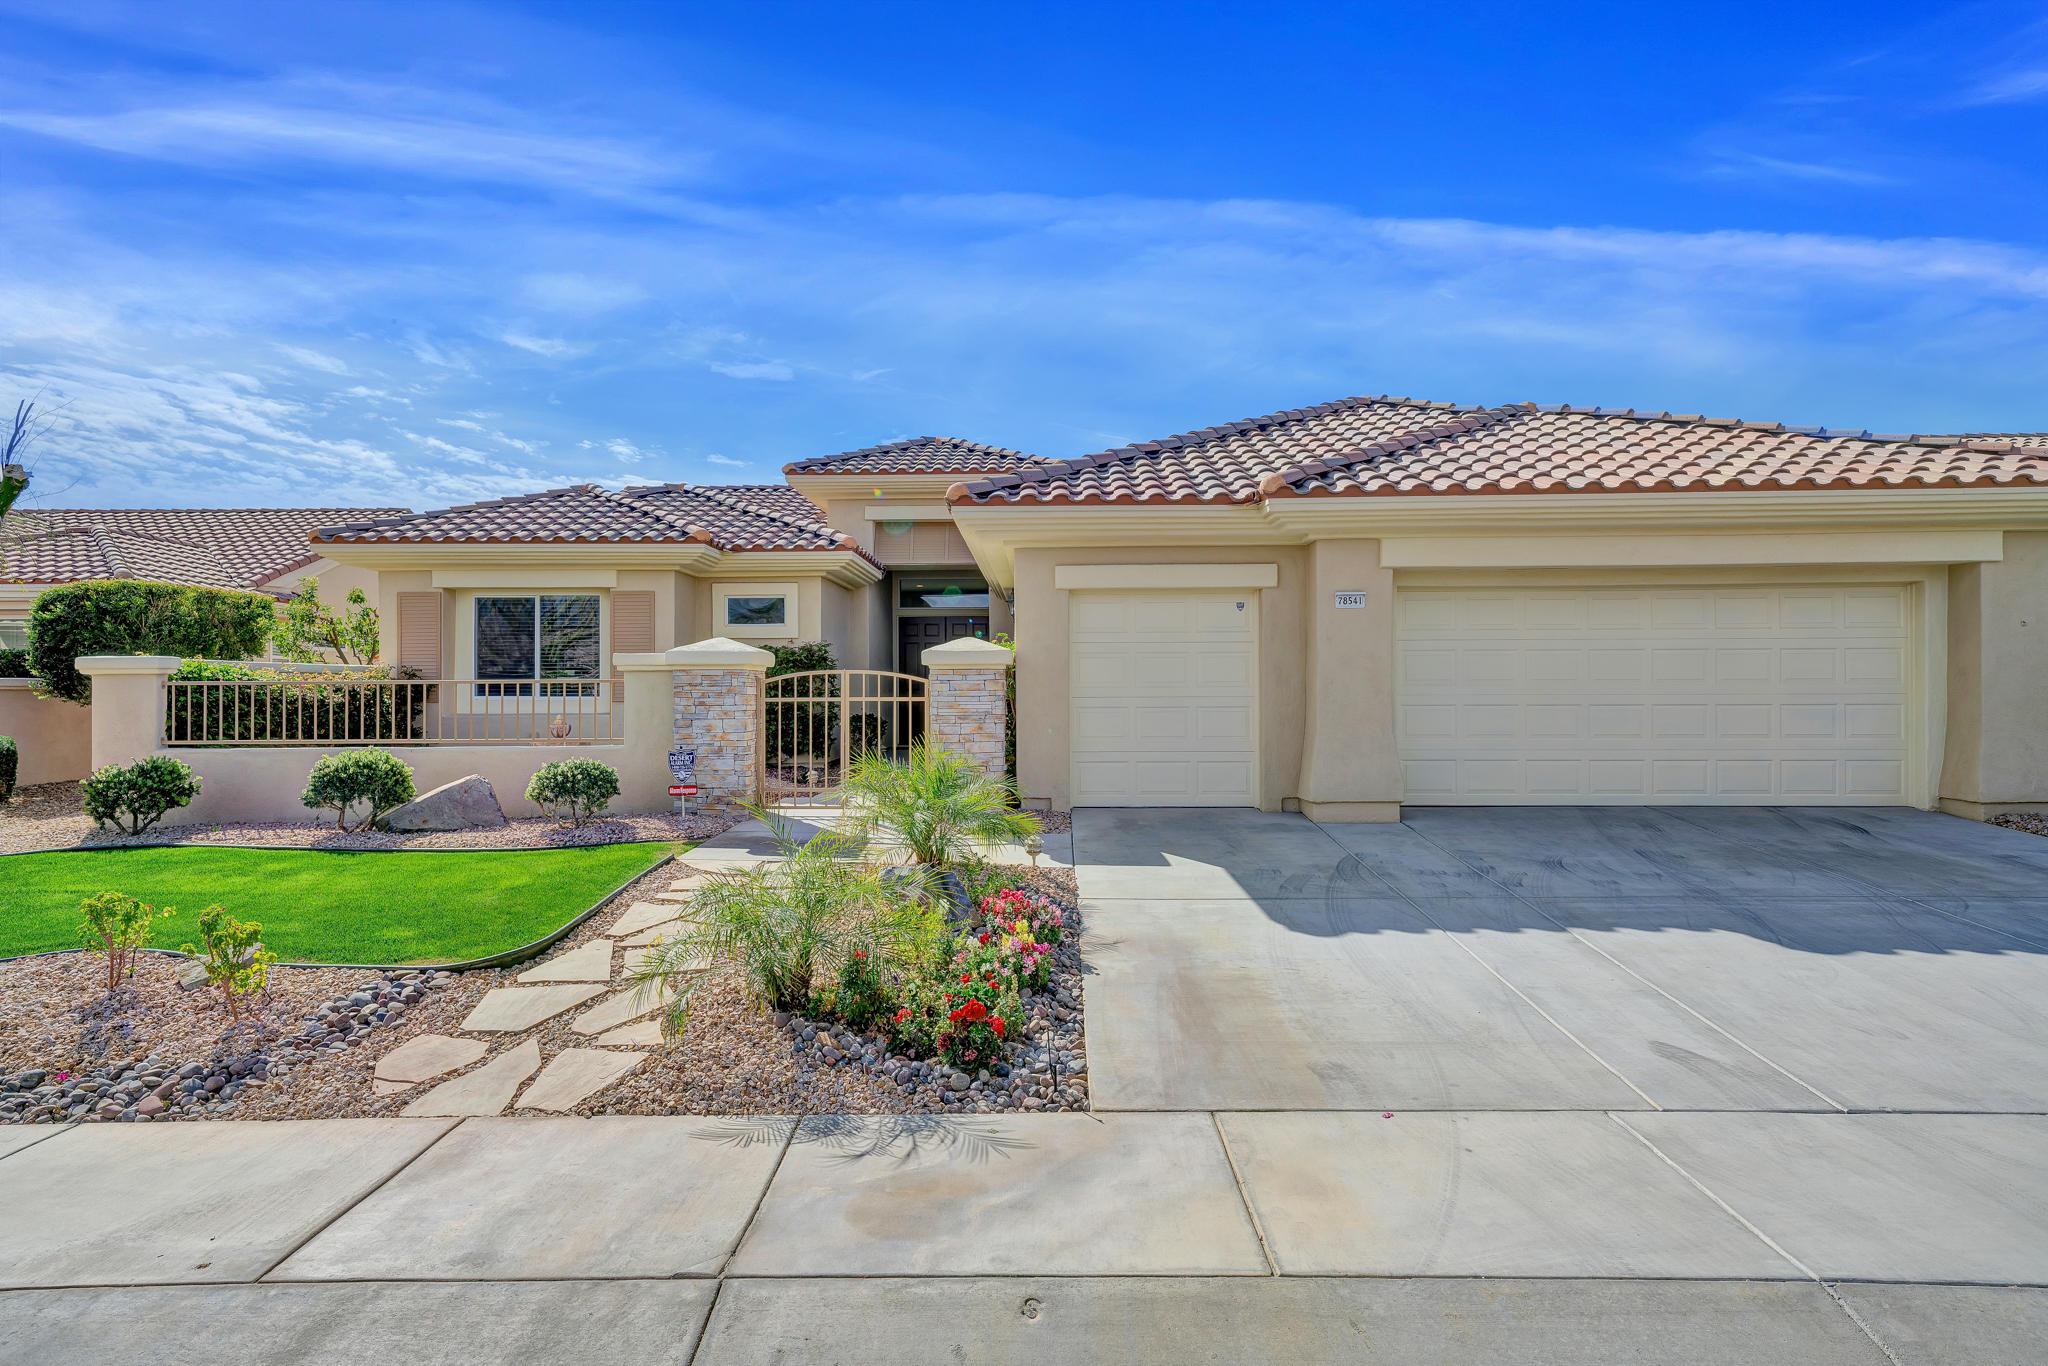 Photo of 78541 Moonstone Lane, Palm Desert, CA 92211